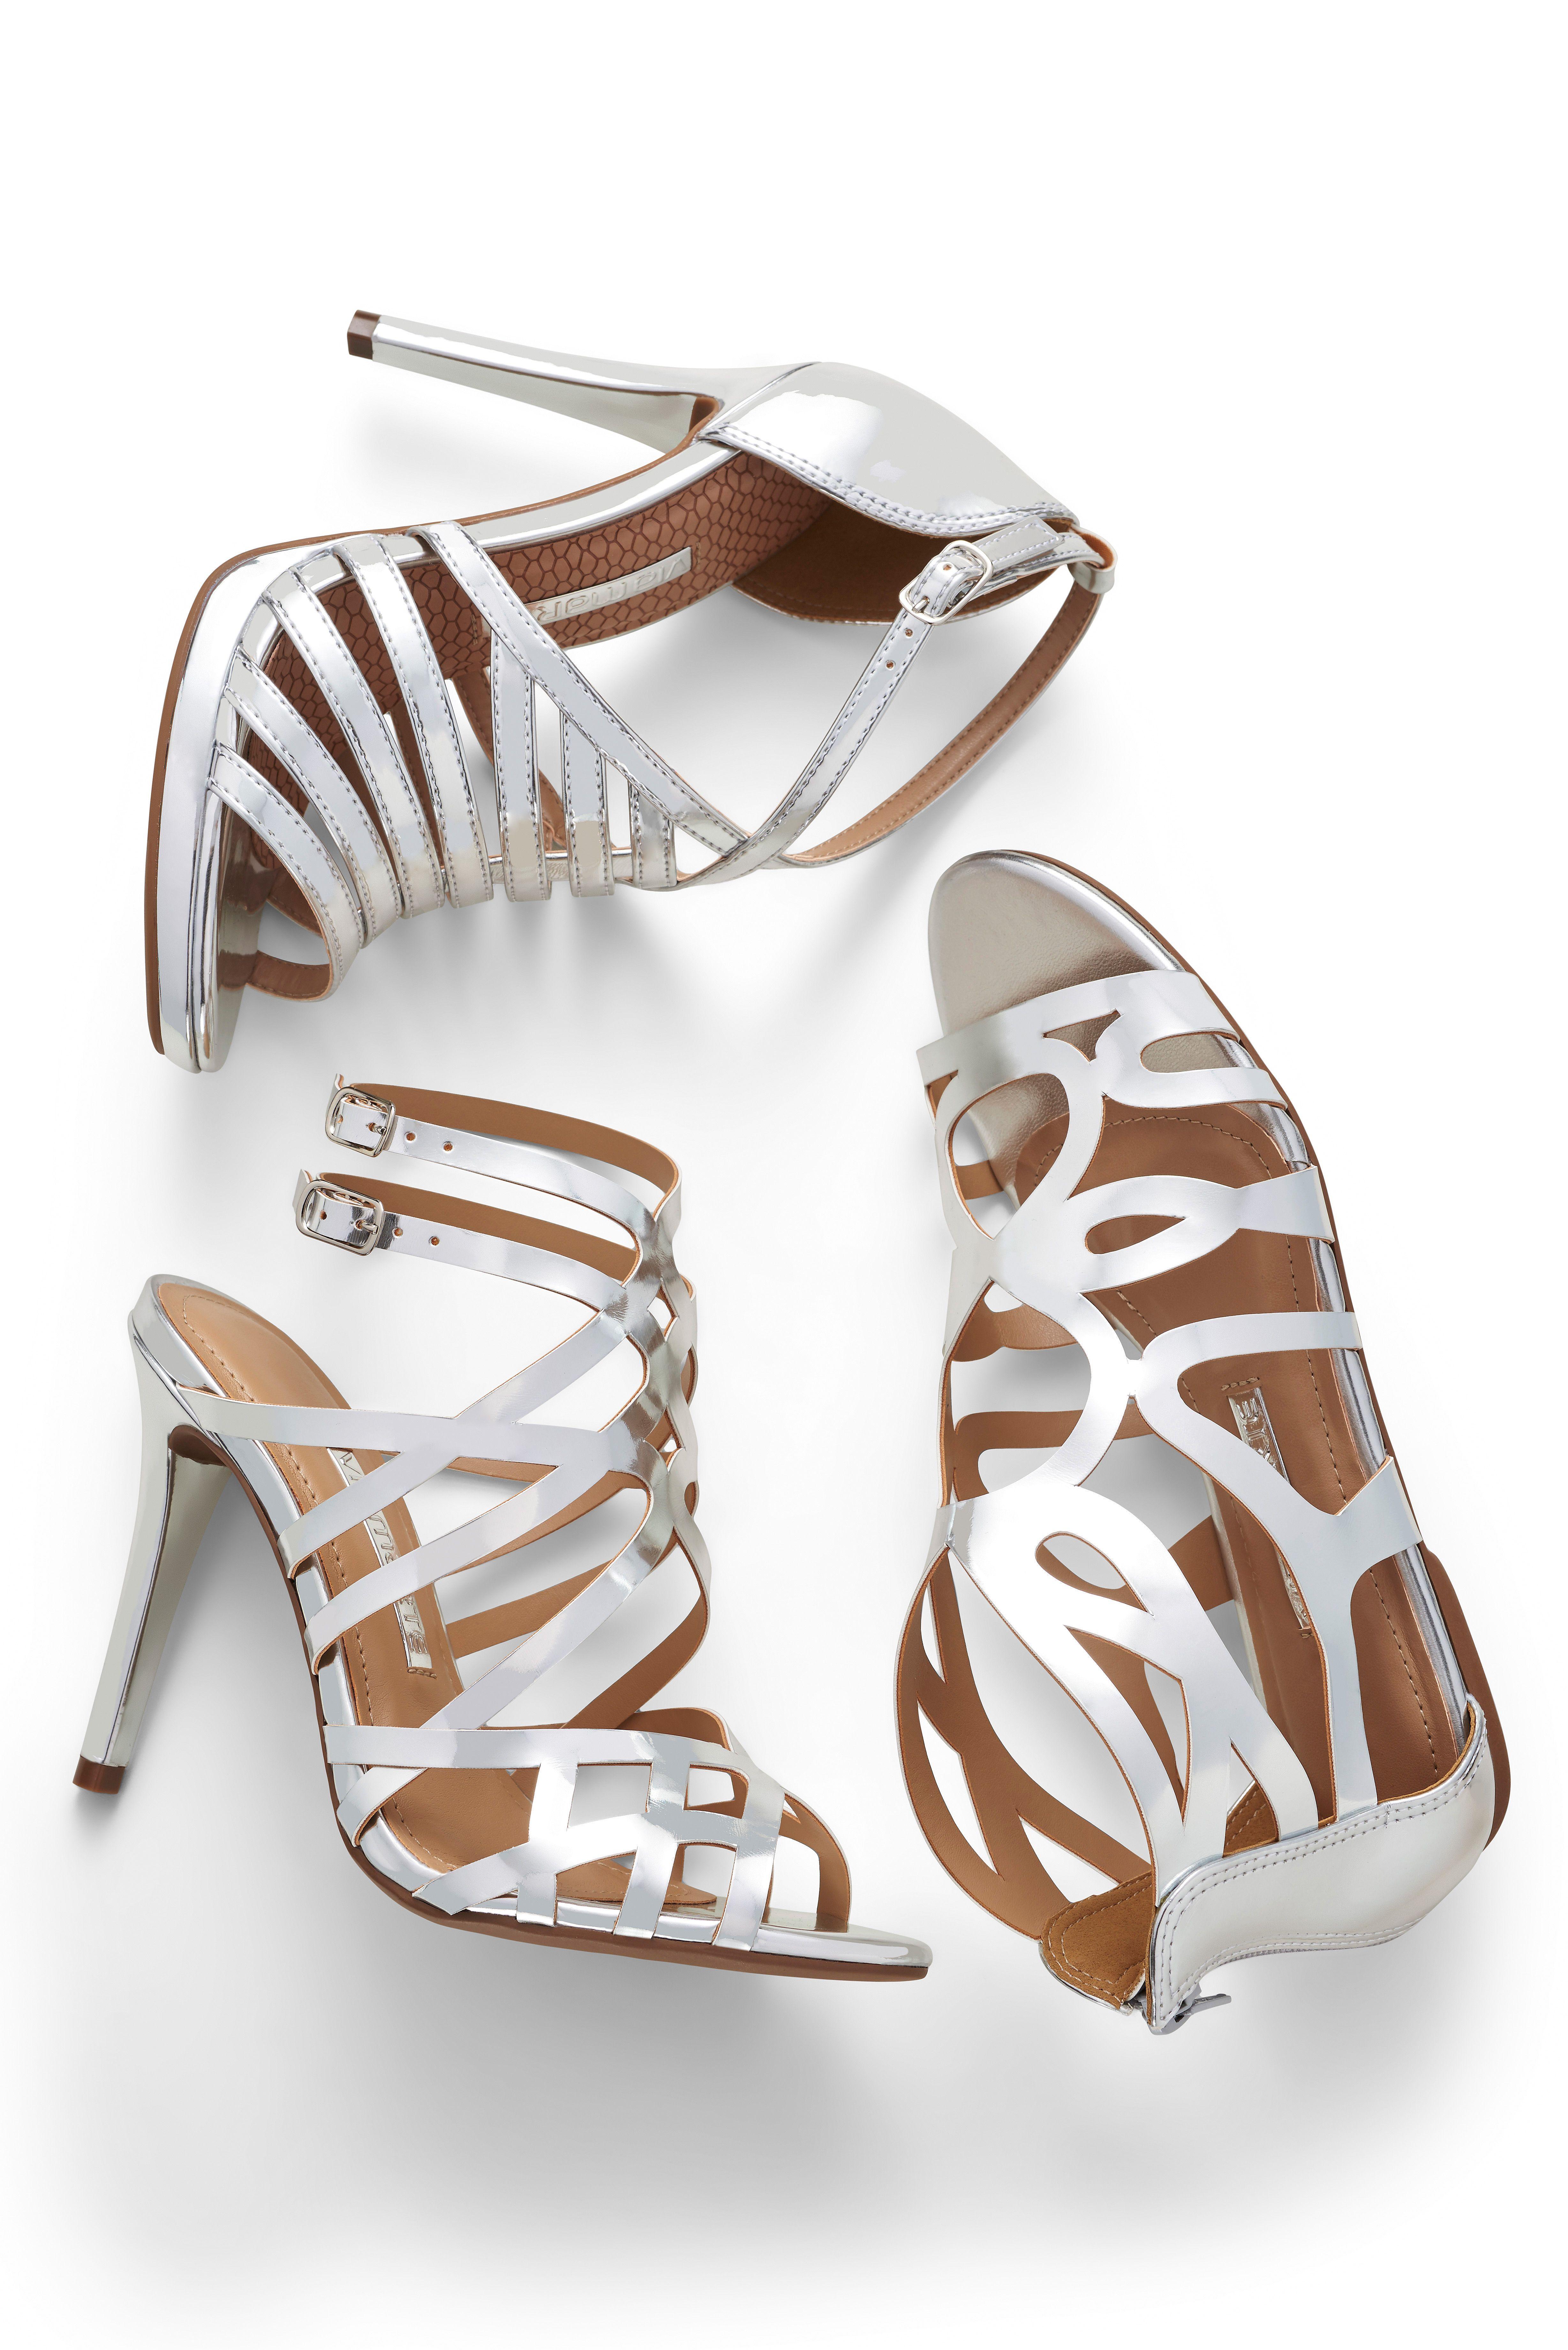 Silver Prata Sandalias Trend Summer Ref 16 18601 16